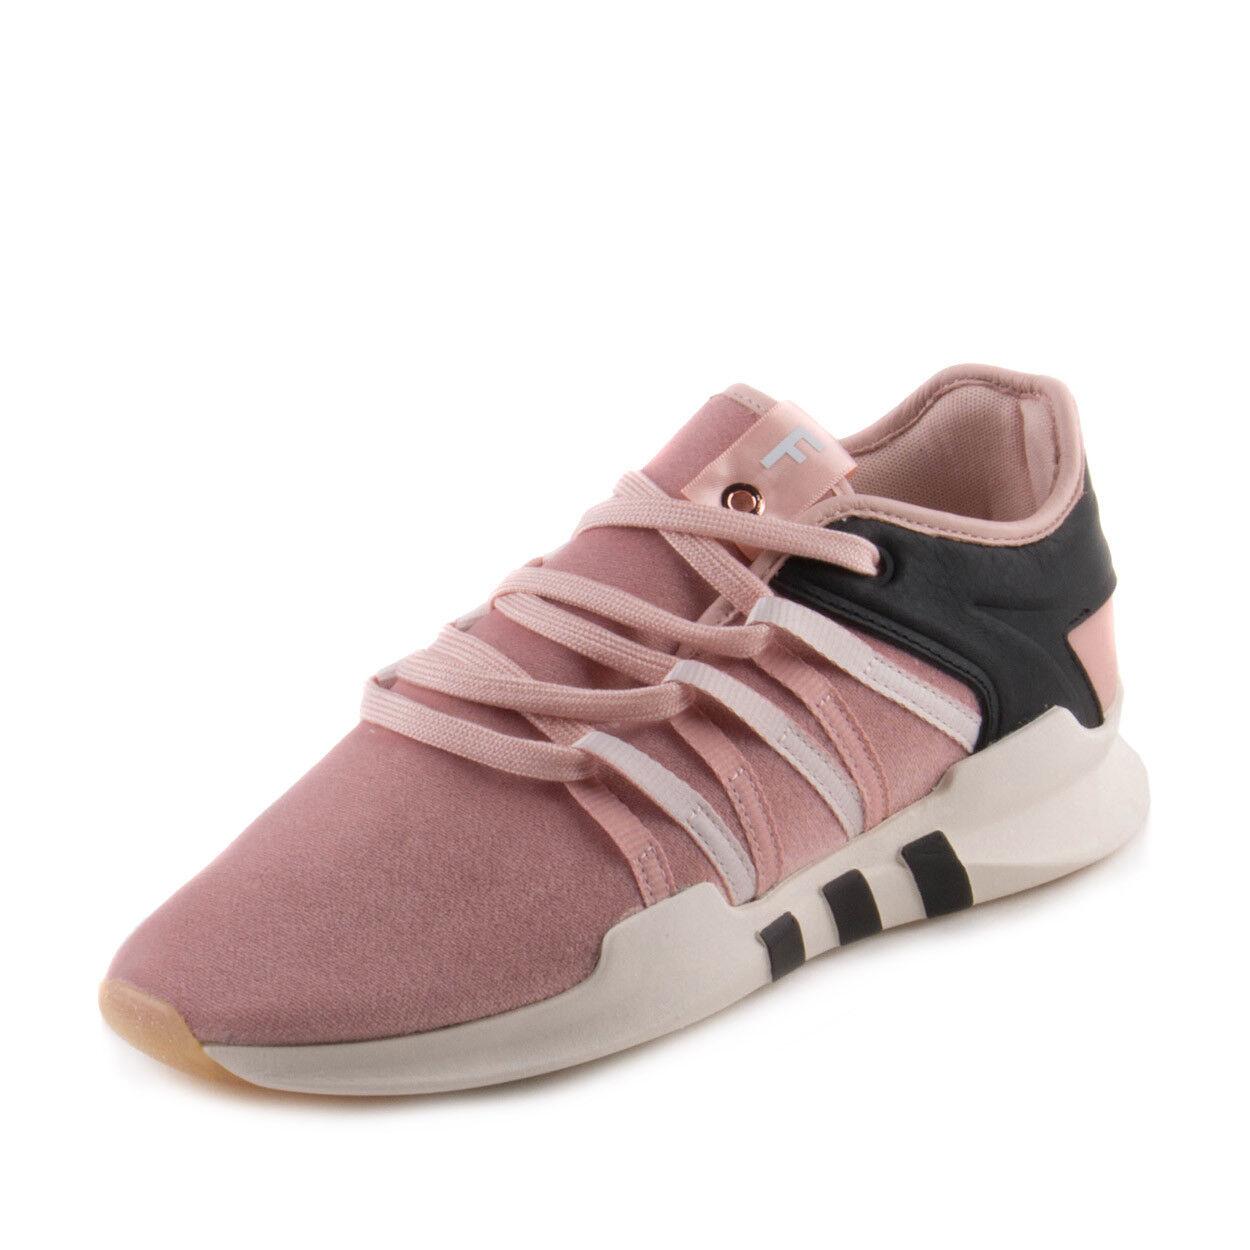 Adidas Femme EQT Lacing Adv W S.E. Overkill X Fruition Rose/Blanc CM7998